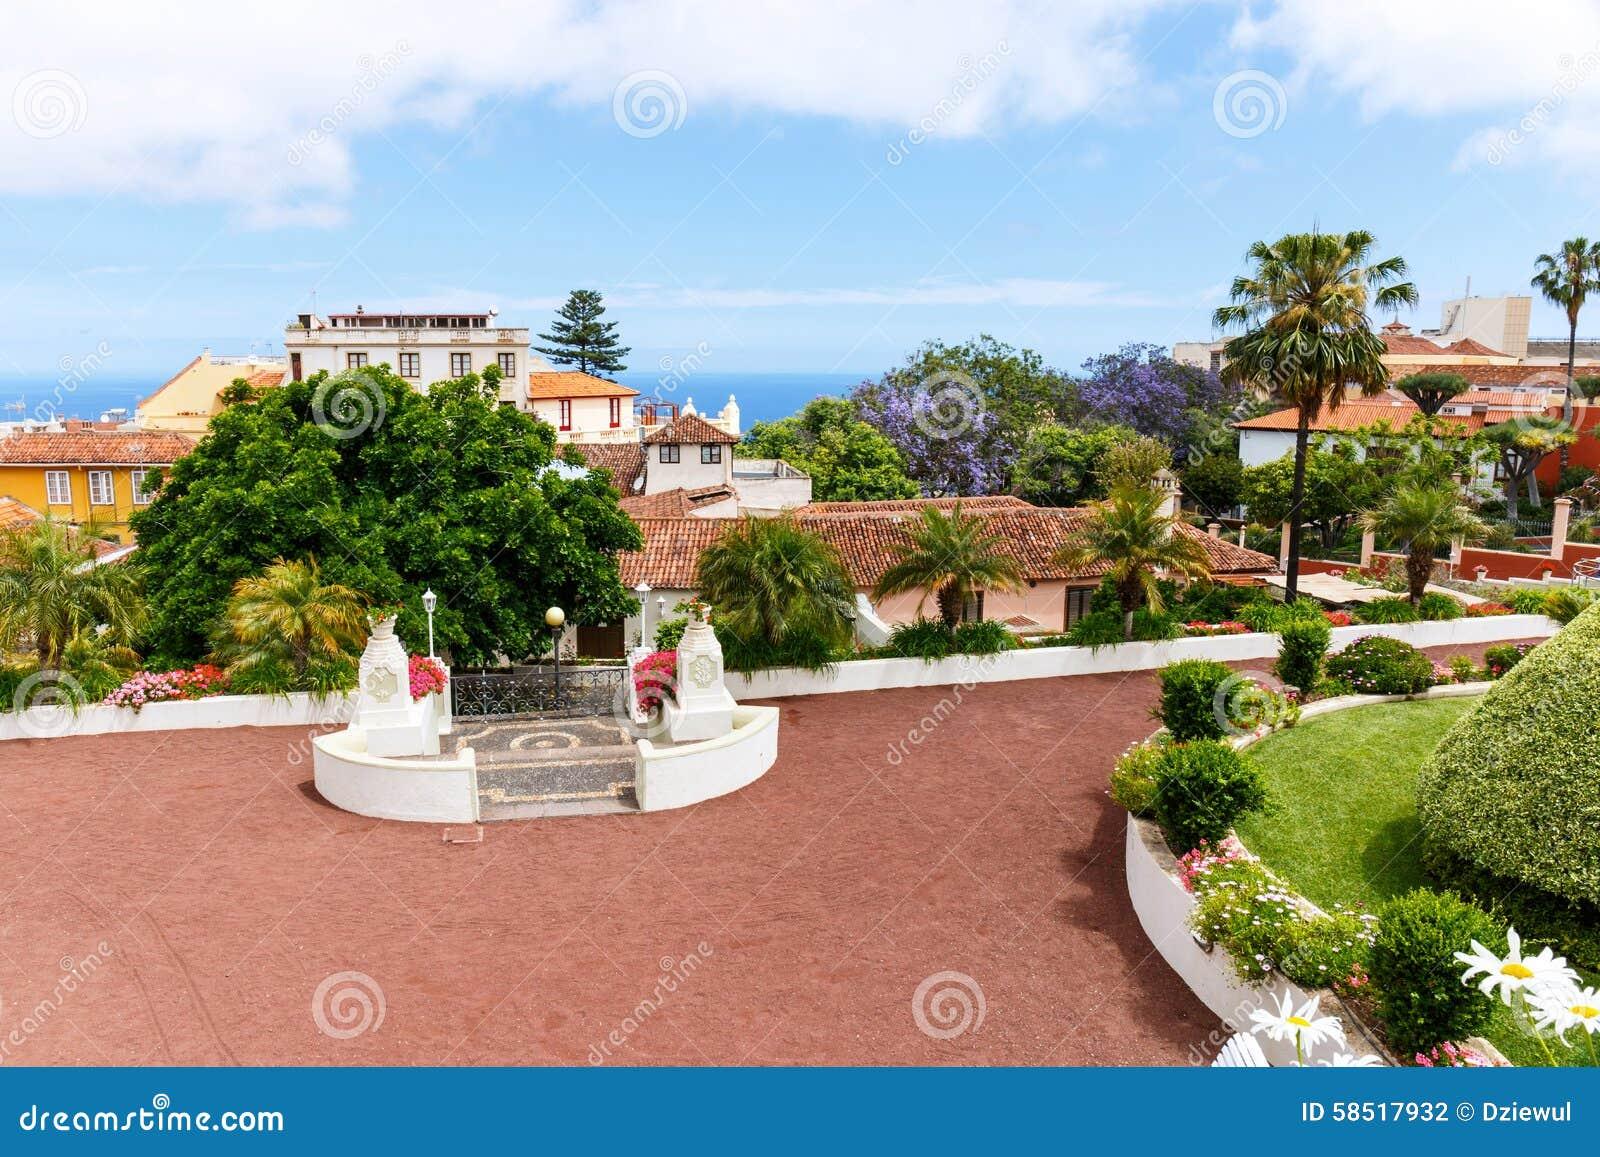 Botanical Garden In La Orotava Town Tenerife Stock Photo